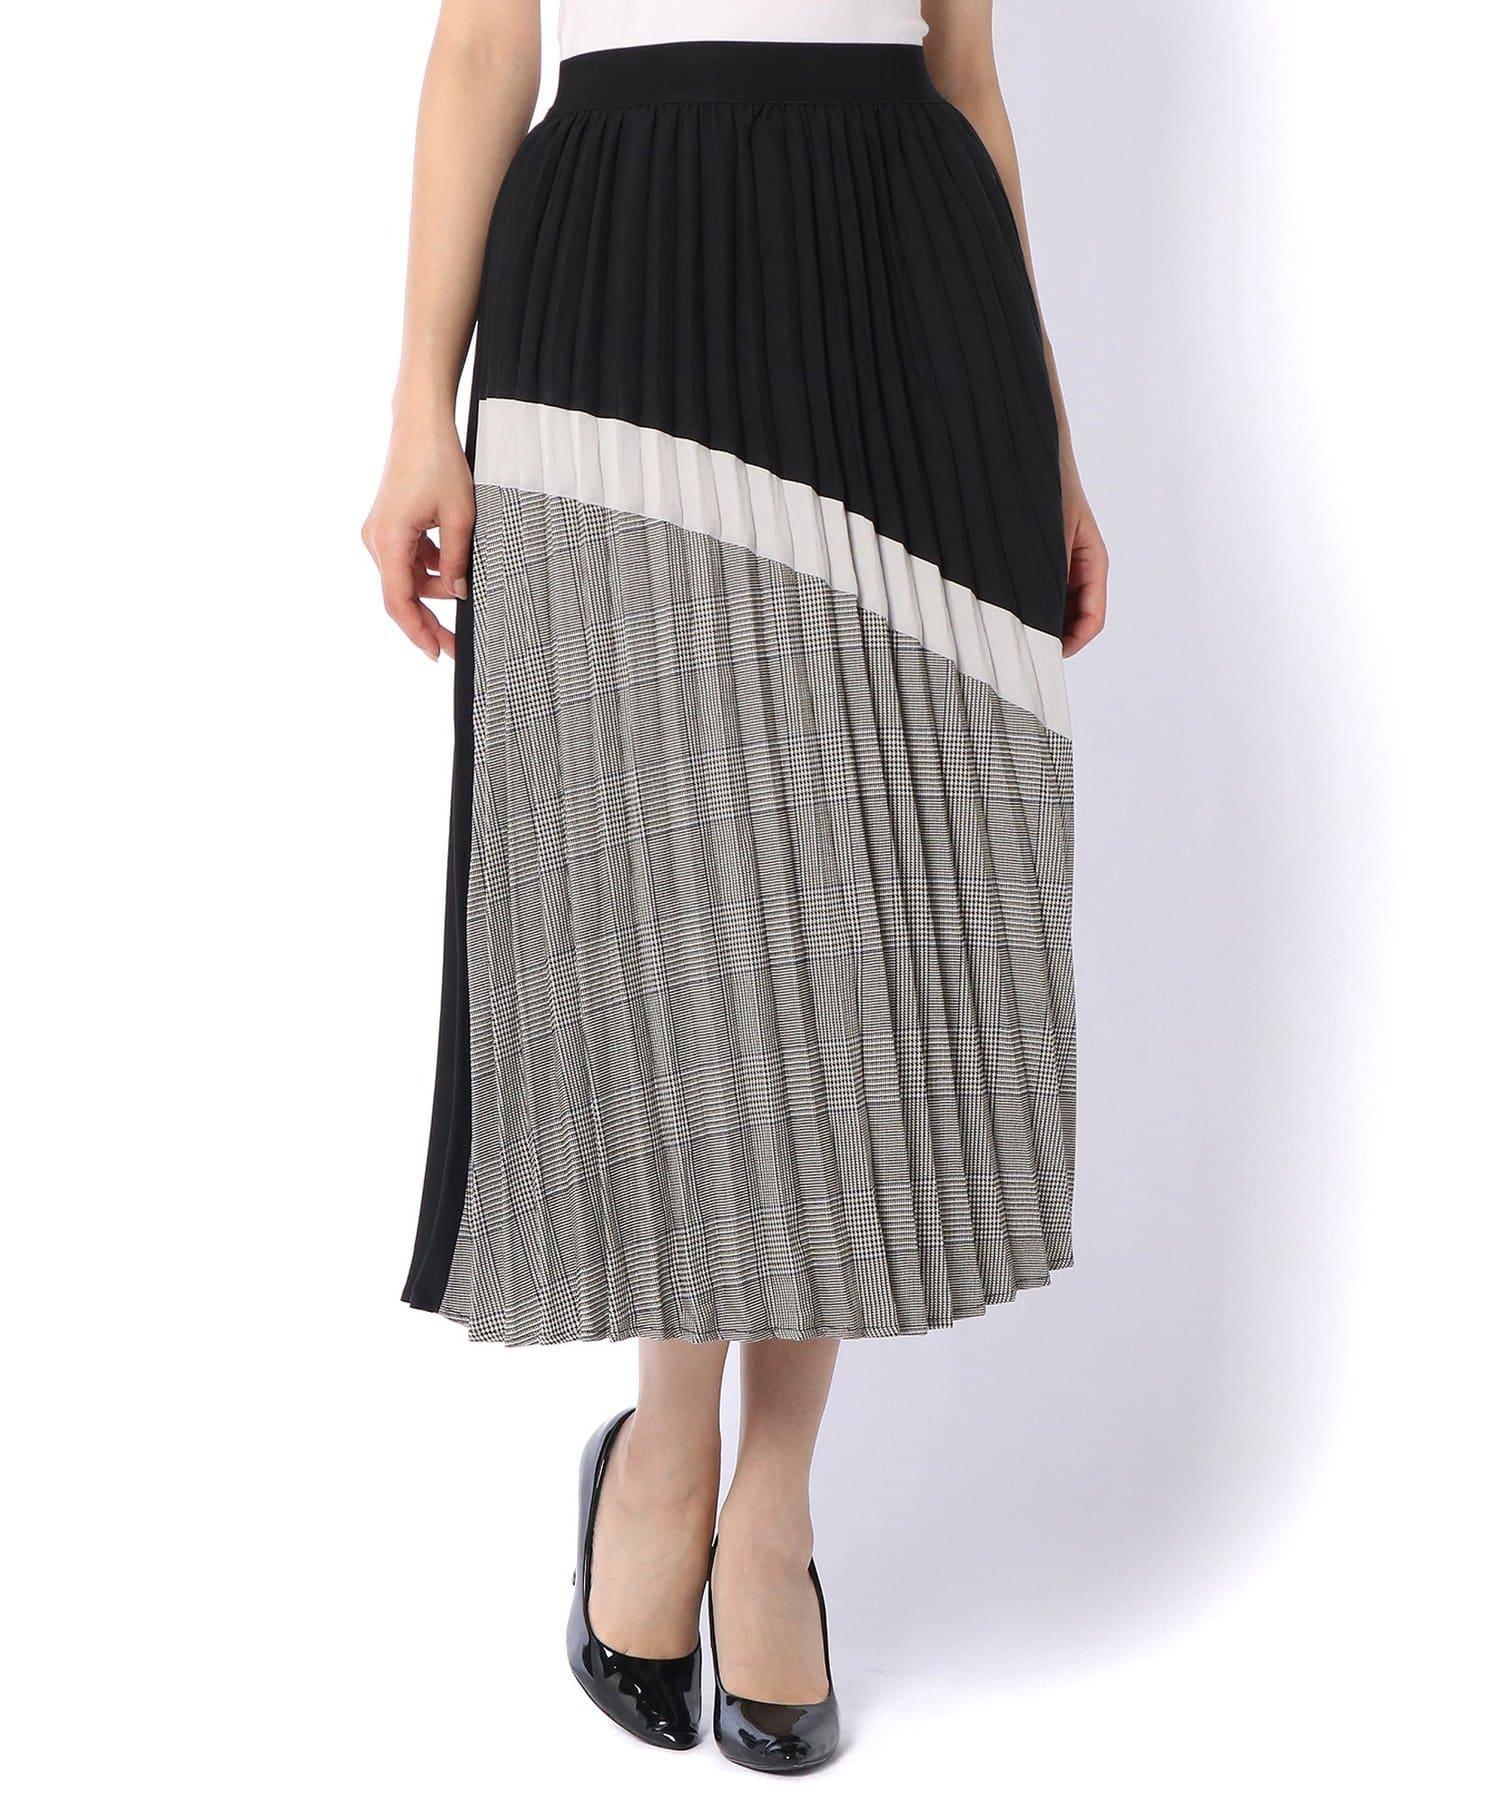 Pal collection(パルコレクション) 《揺れを楽しんで》チェック切替プリーツスカート